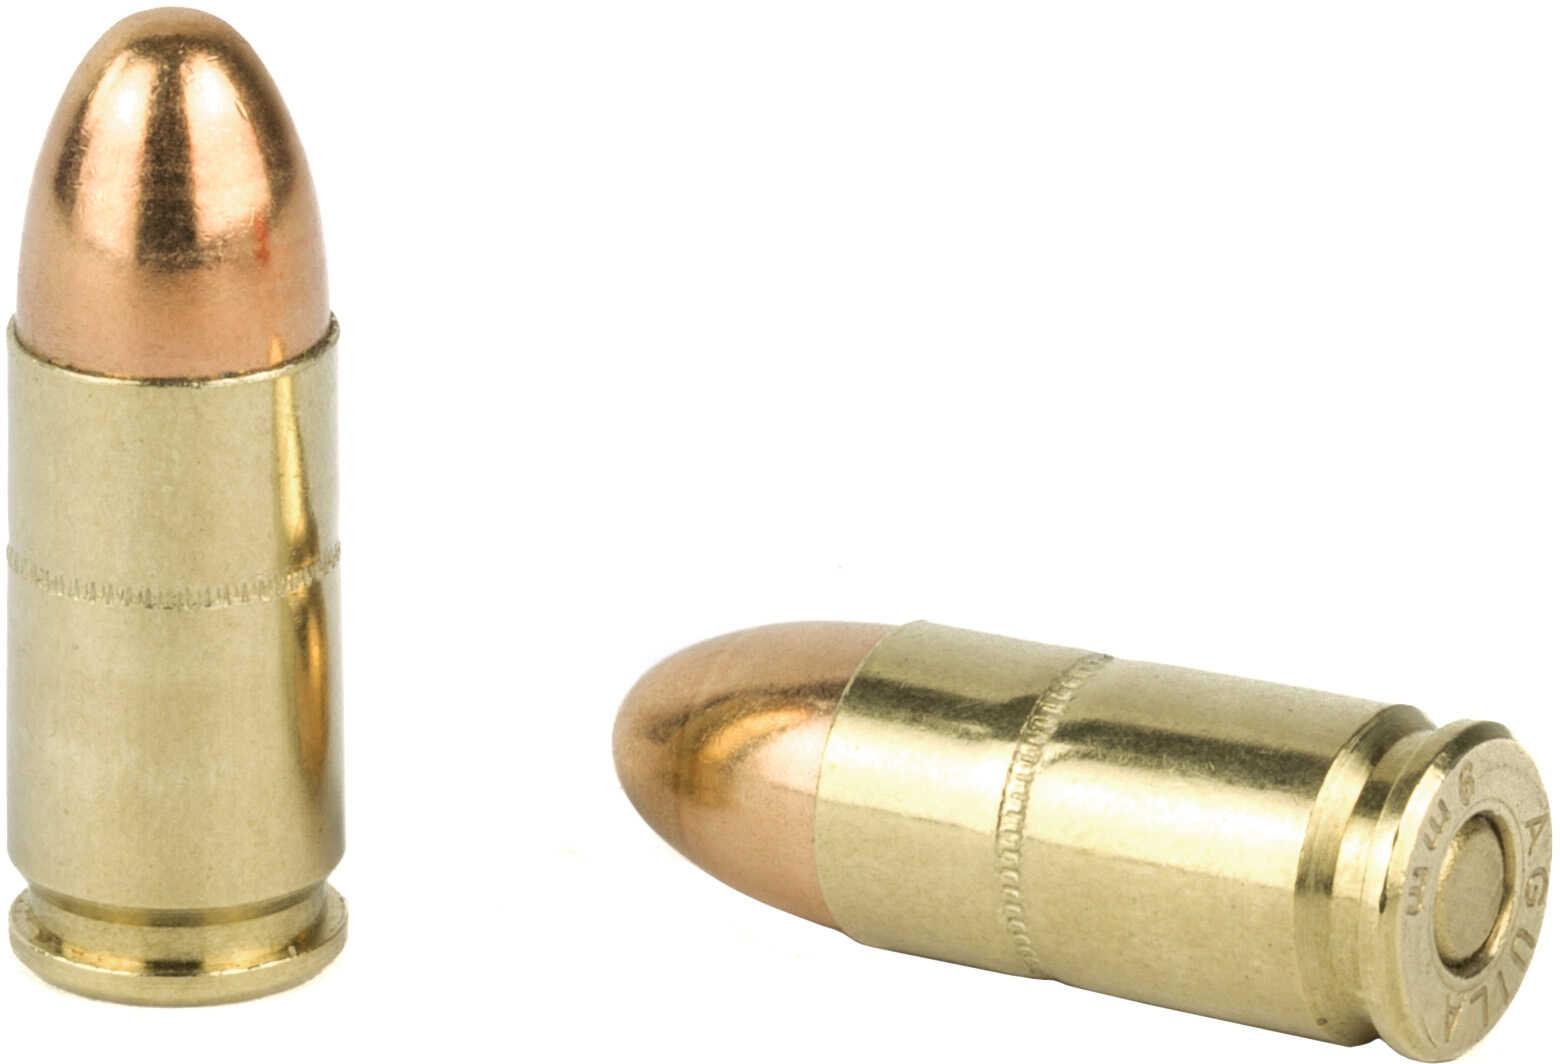 Aguila Ammunition Pistol 9MM 124 Grain Full Metal Jacket 50 Round Box 1E092110